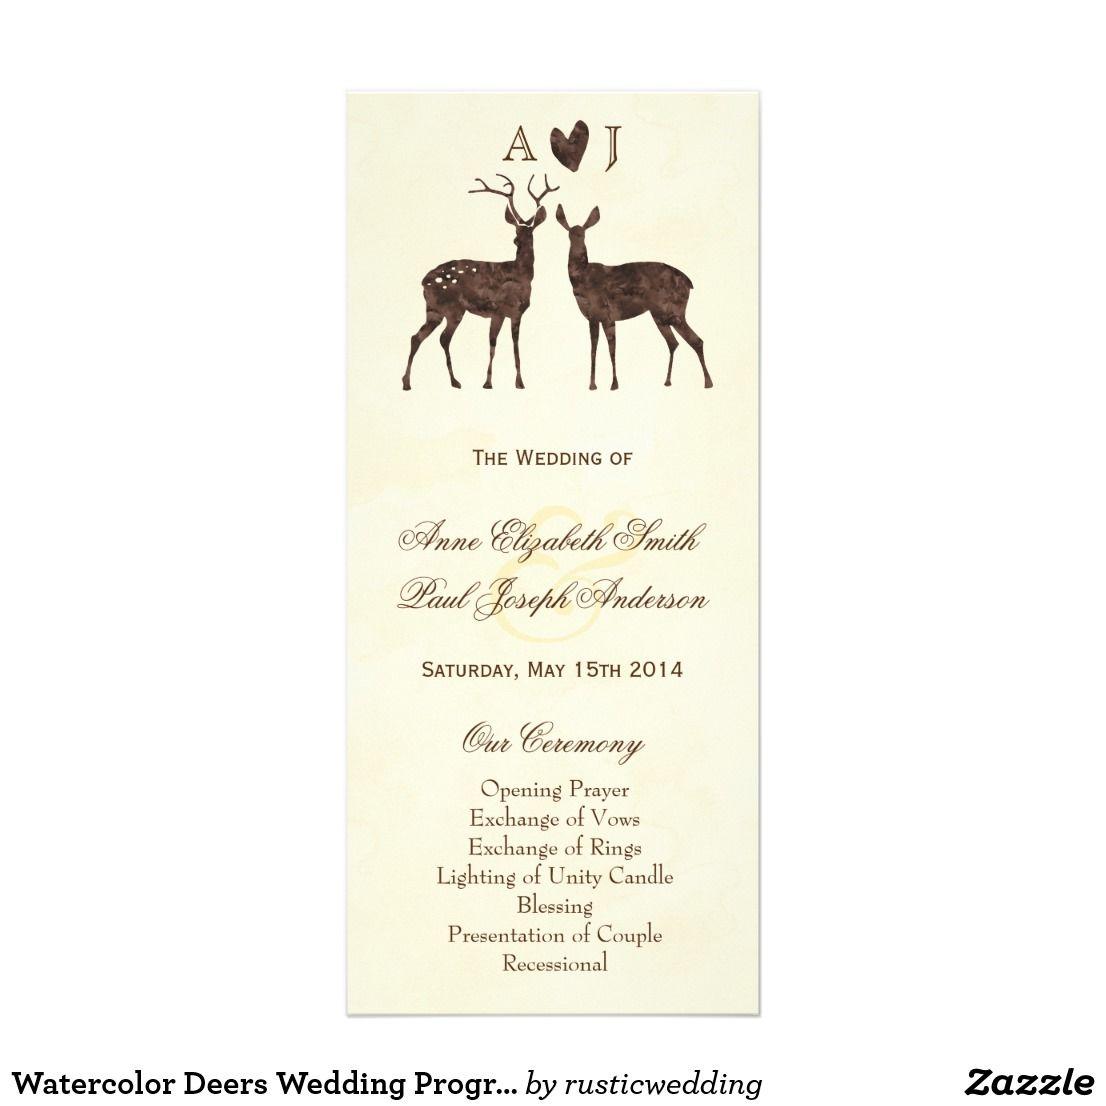 Watercolor Deers Wedding Program Wedding Programs And Weddings